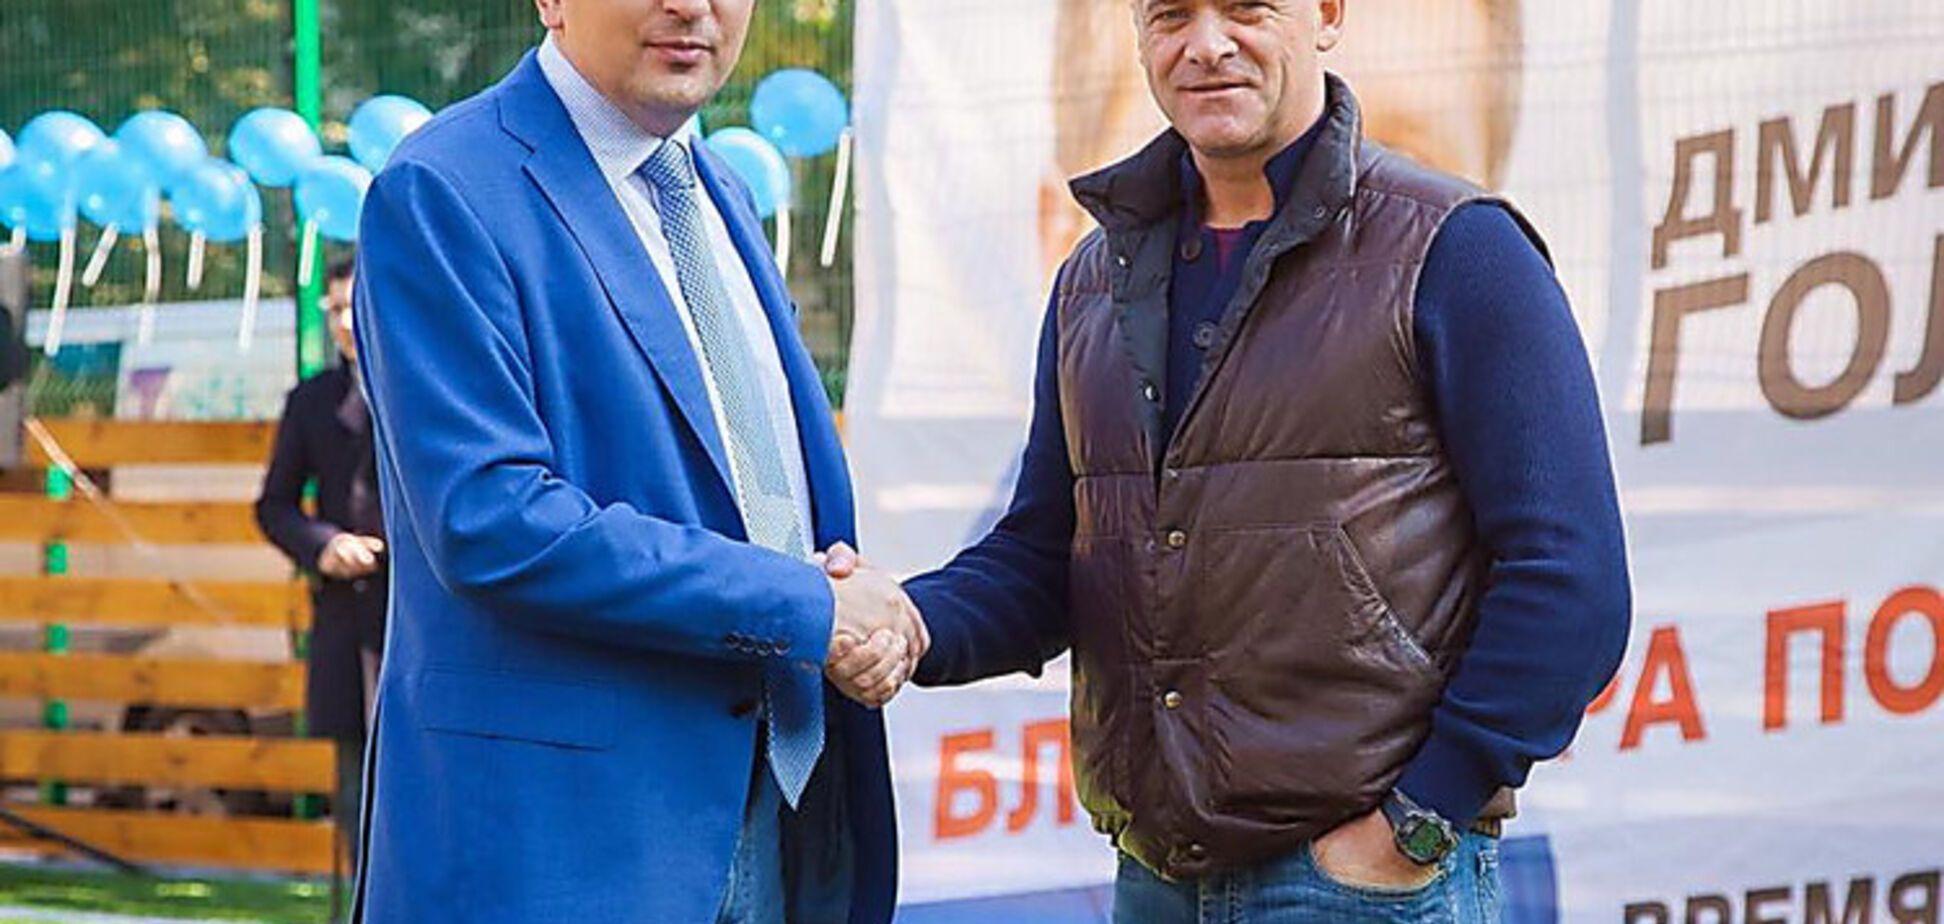 Нардеп, взявший на поруки Труханова, задекларировал биткоинов на 2 млрд